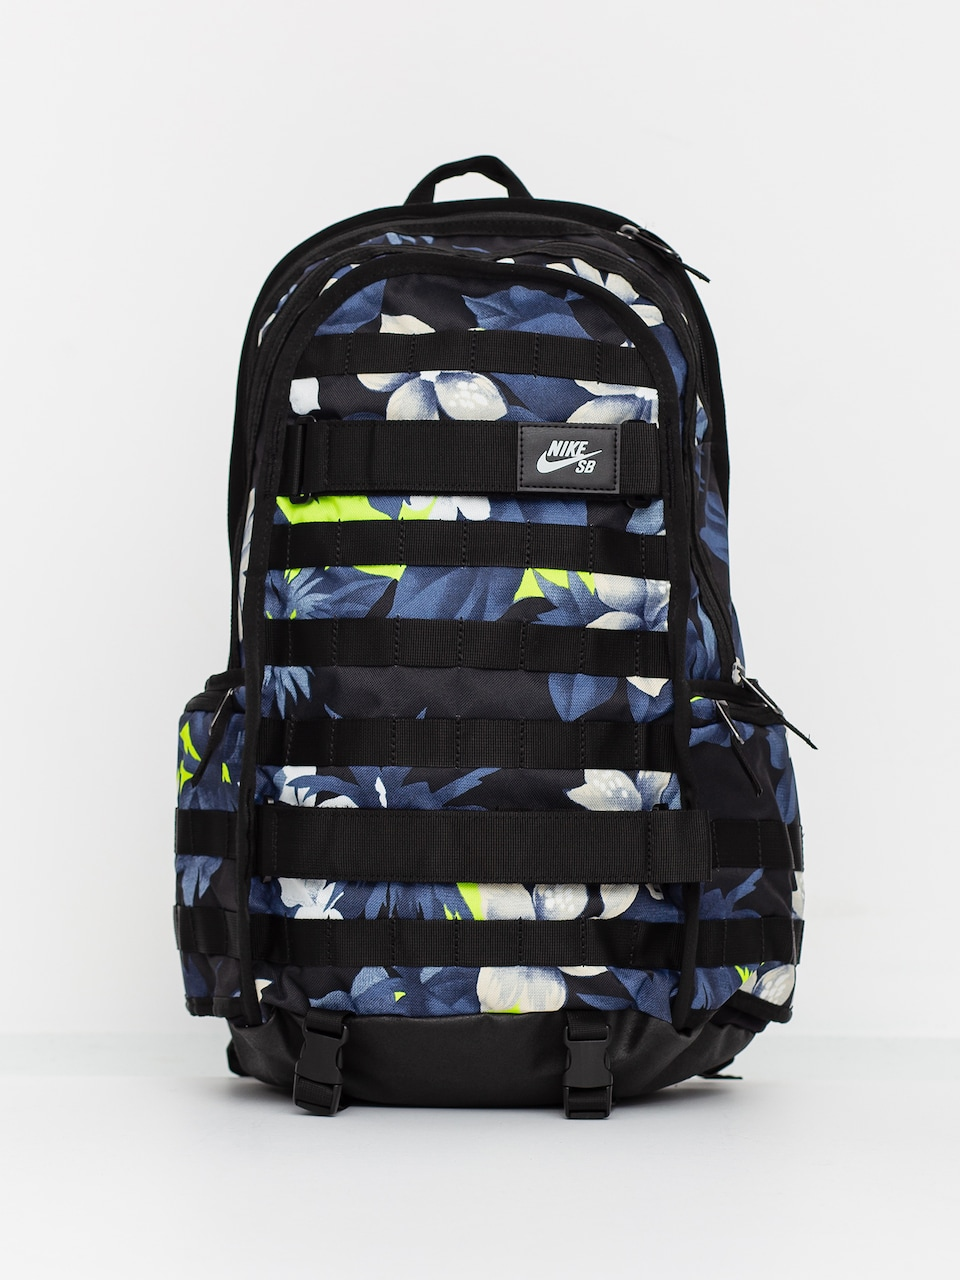 Nike SB Rpm Rucksack (blackblackwhite)